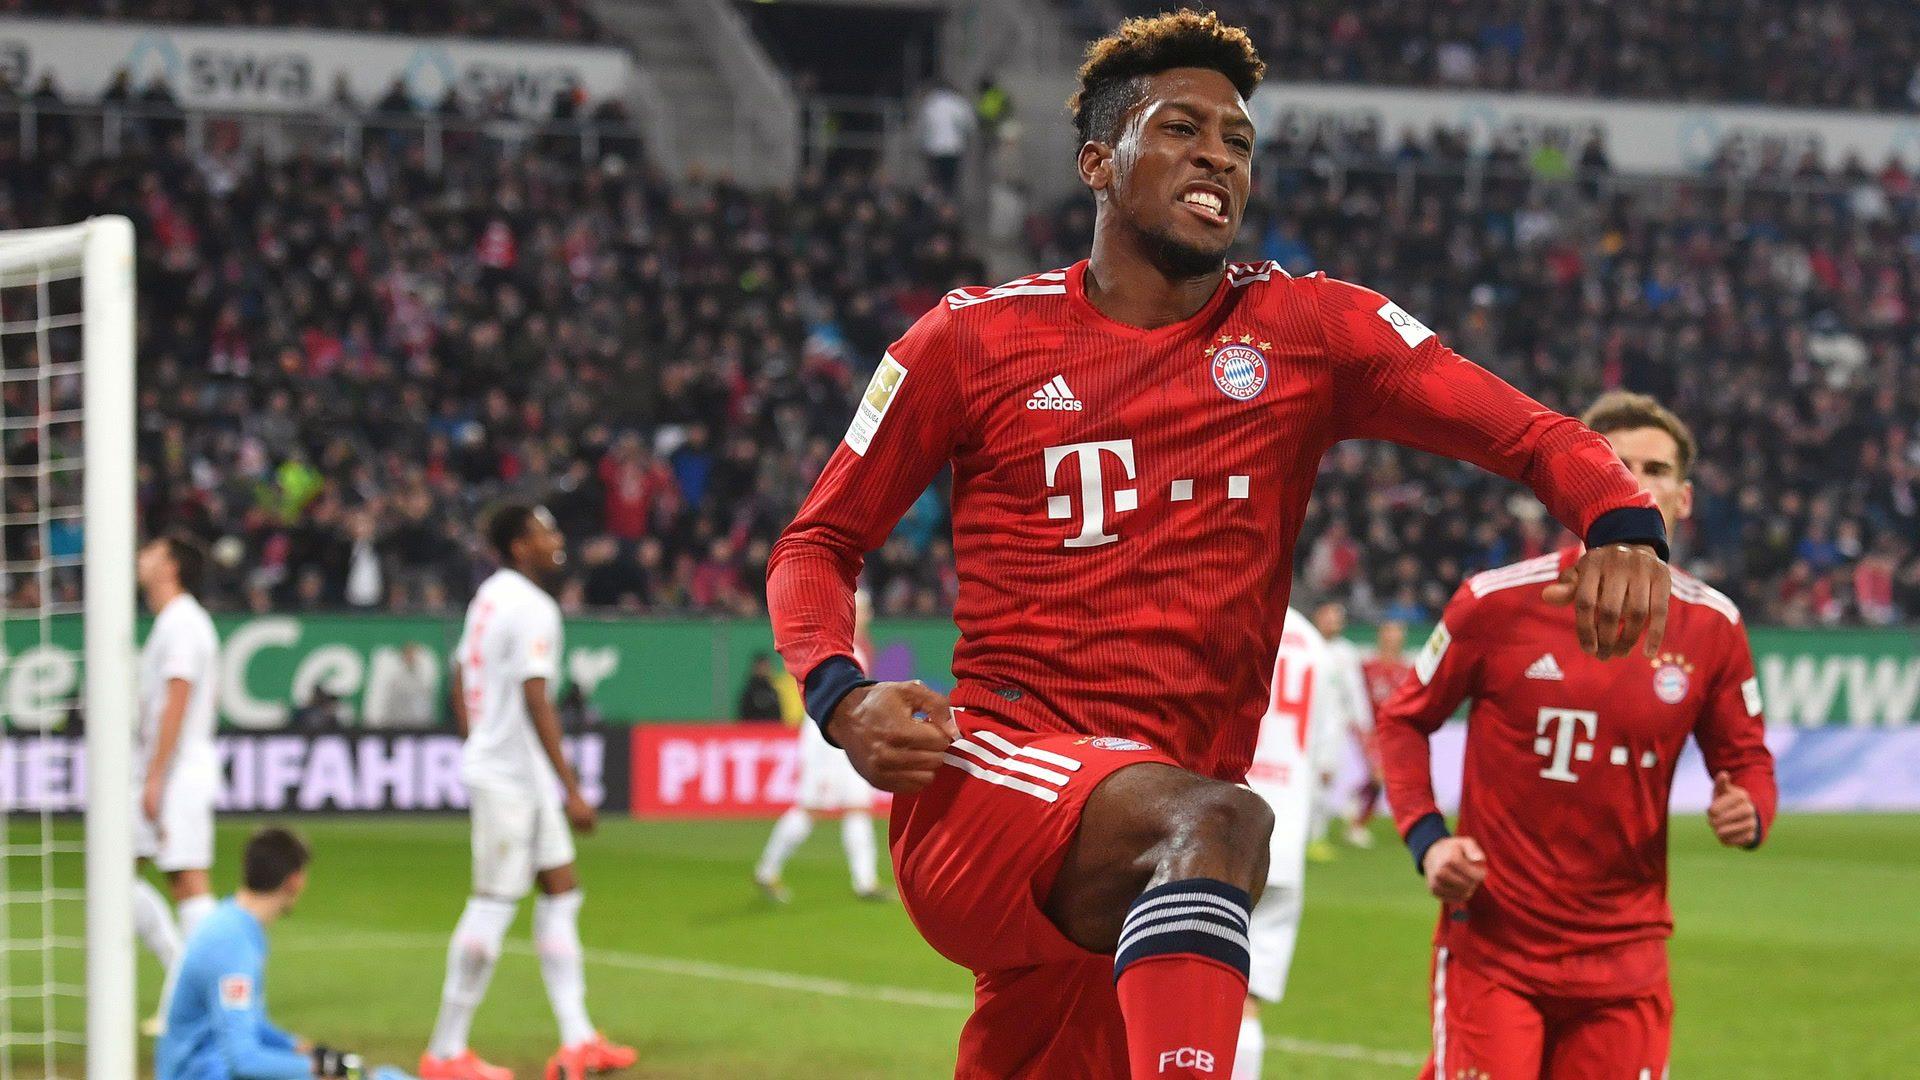 Coman shines as Bayern survive Augsburg scare